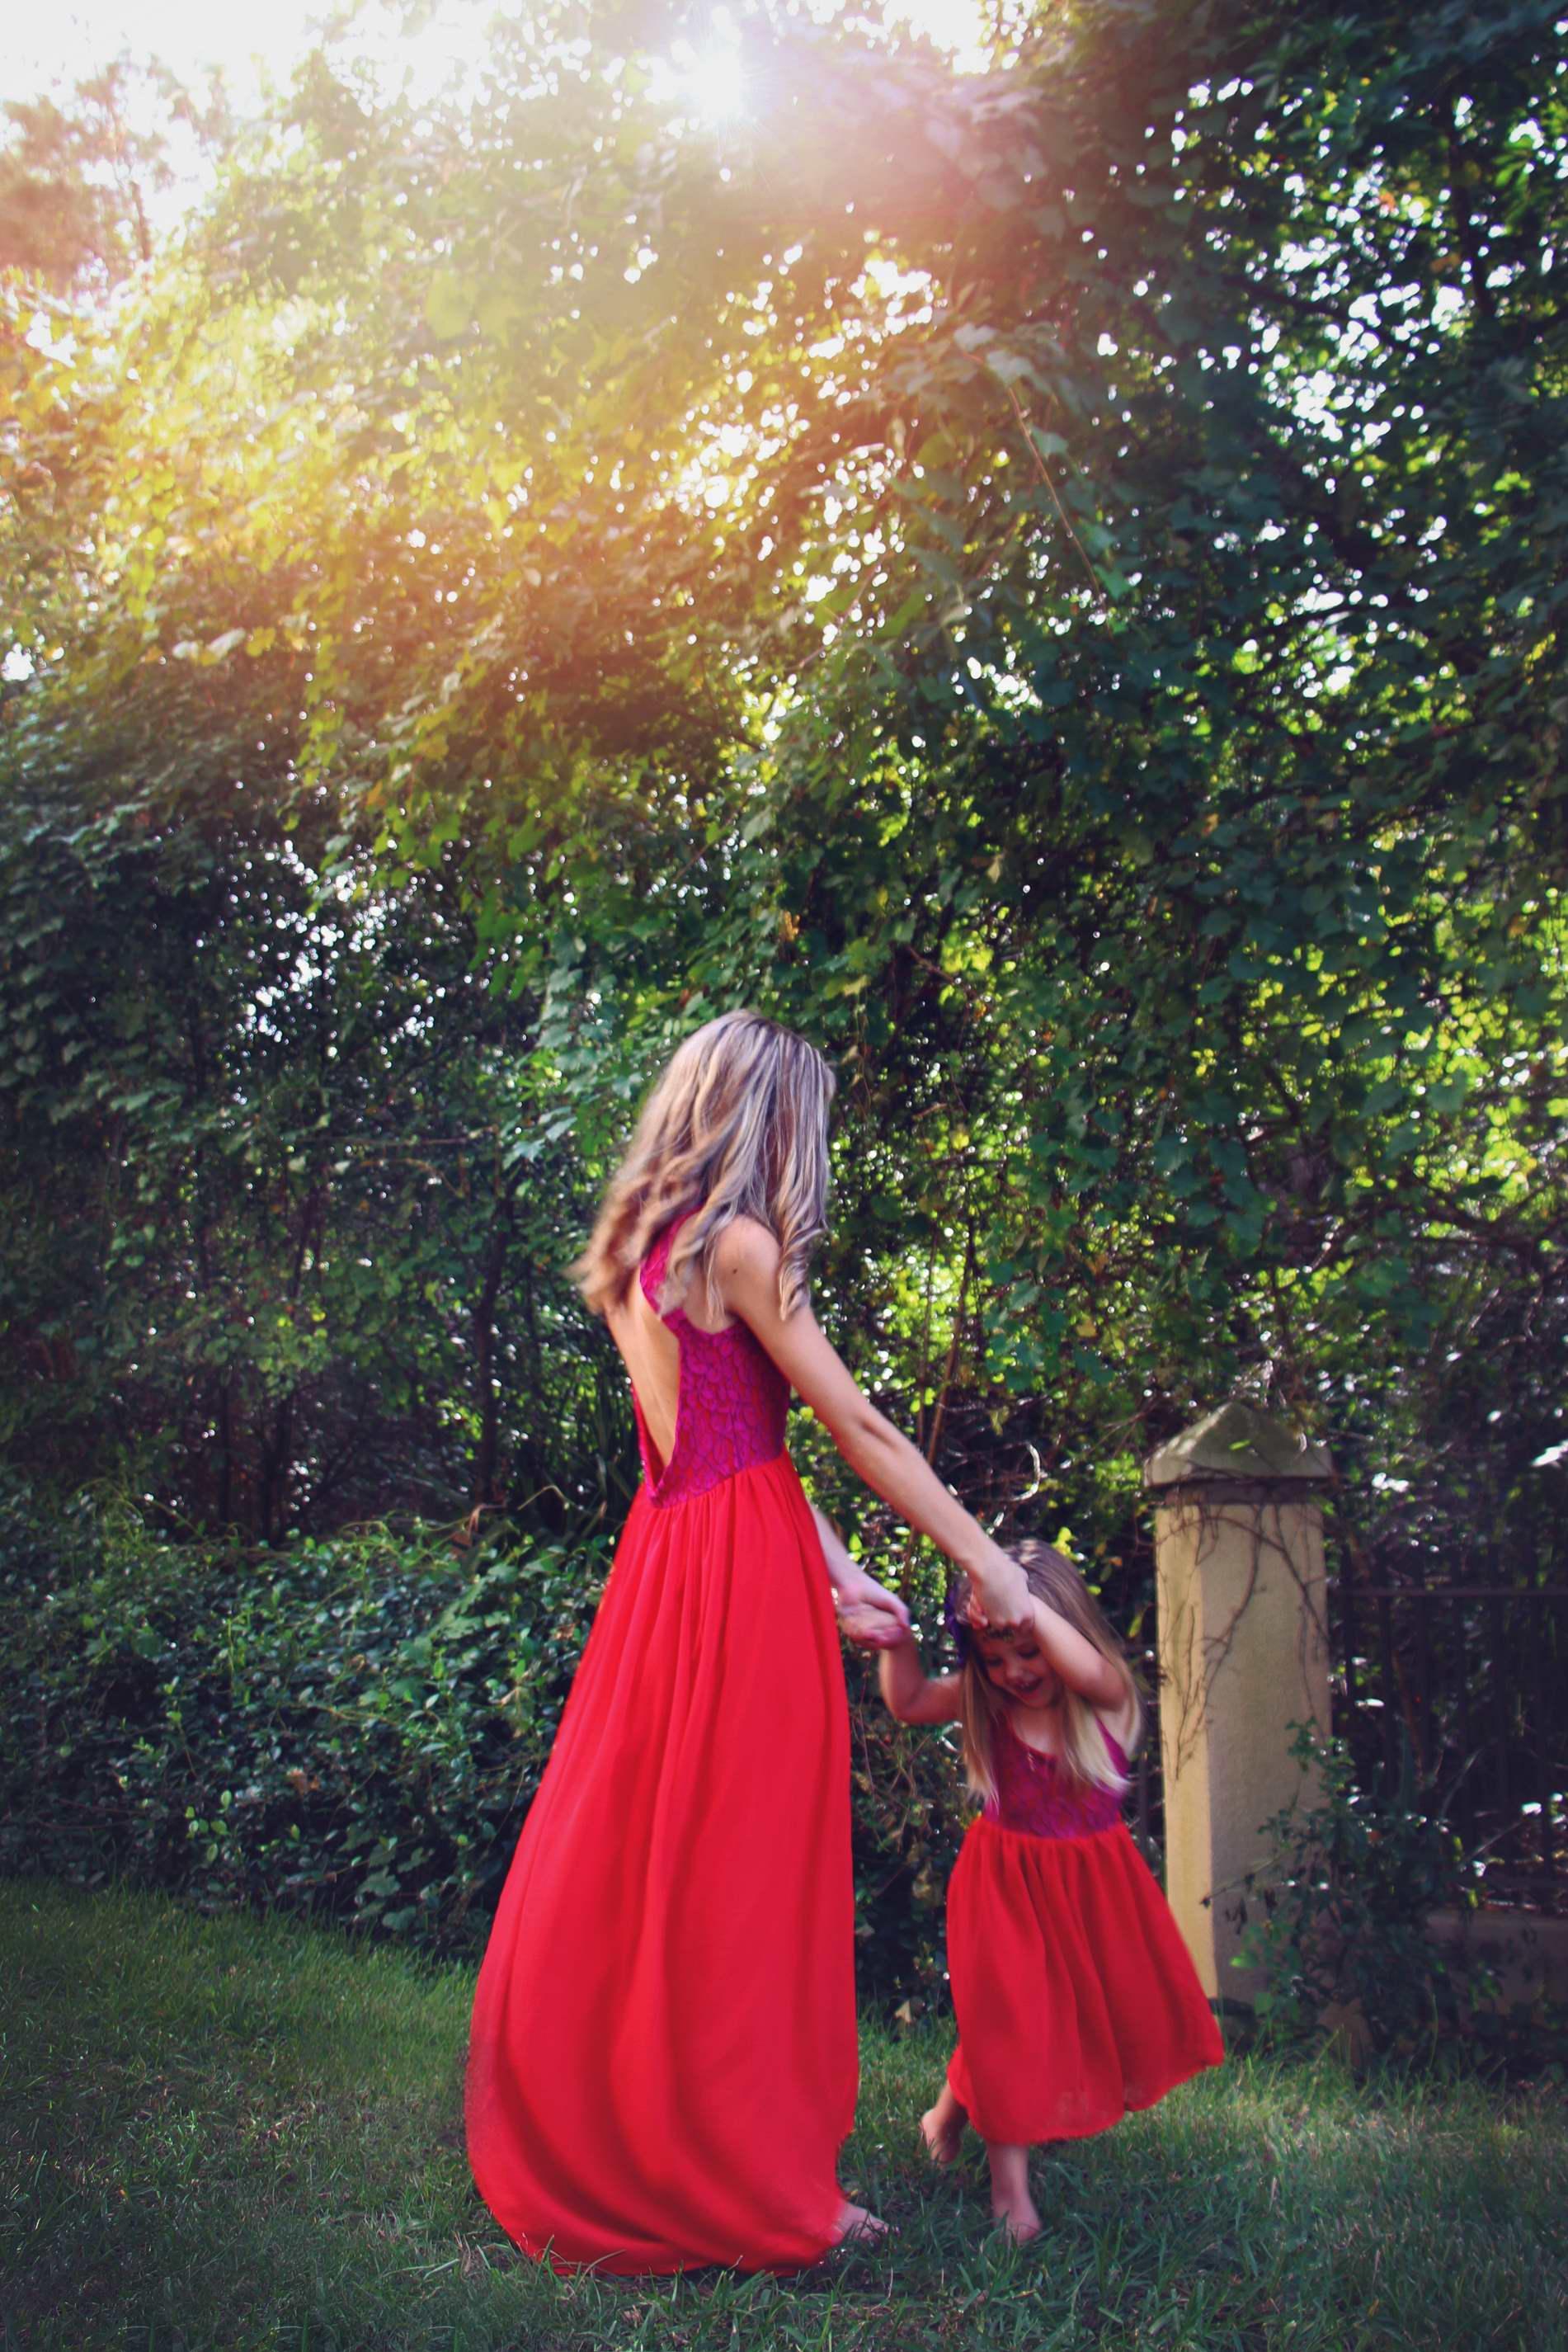 – 19 c mommy and me mom daughter matching katherine eastman photography miami photographer orlando ohio atlanta portrait fairytale